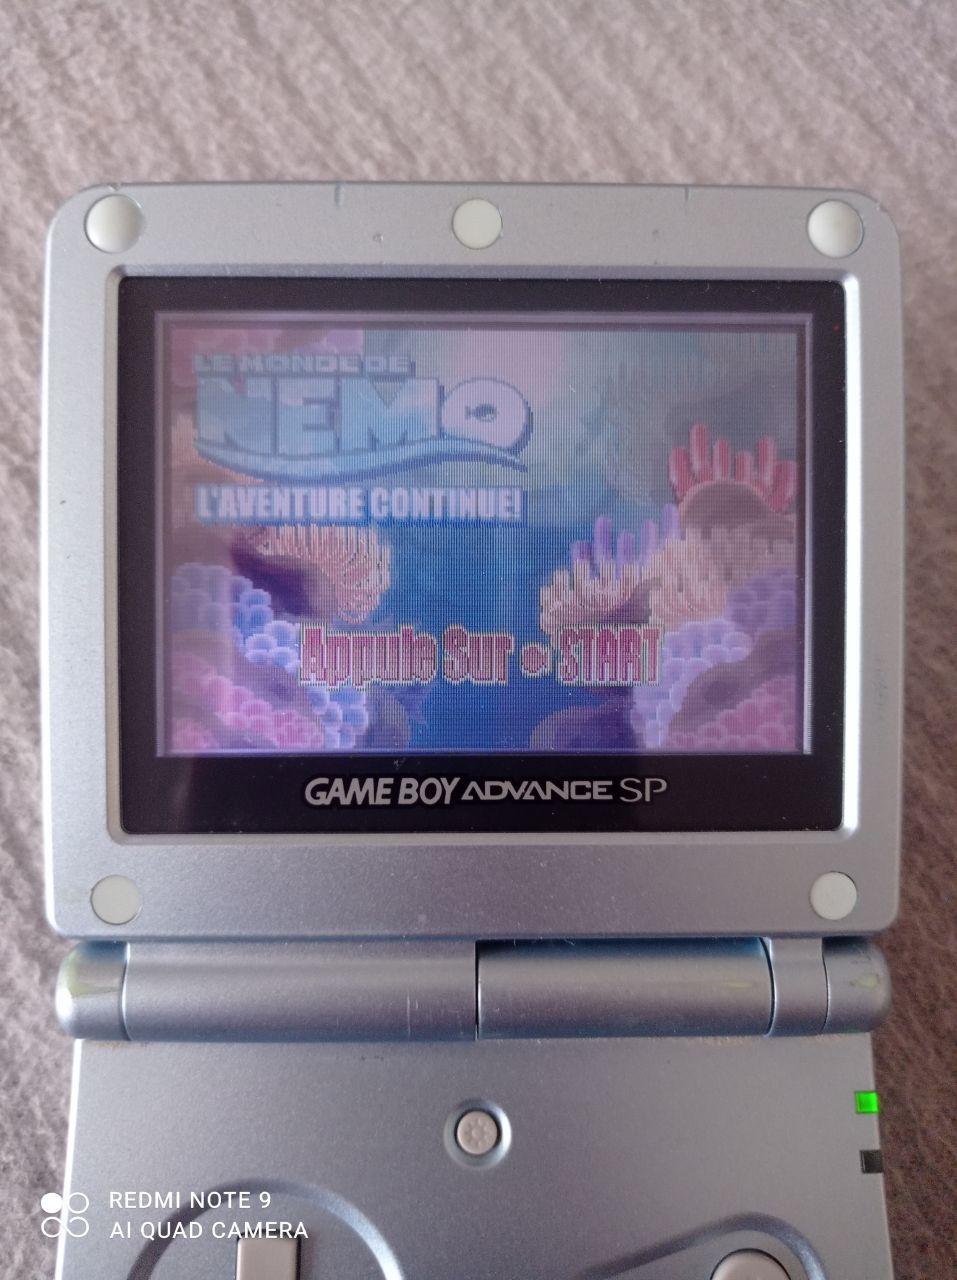 Image article Nintendo - Game boy advance -  Le monde de Nemo - L'aventure continue